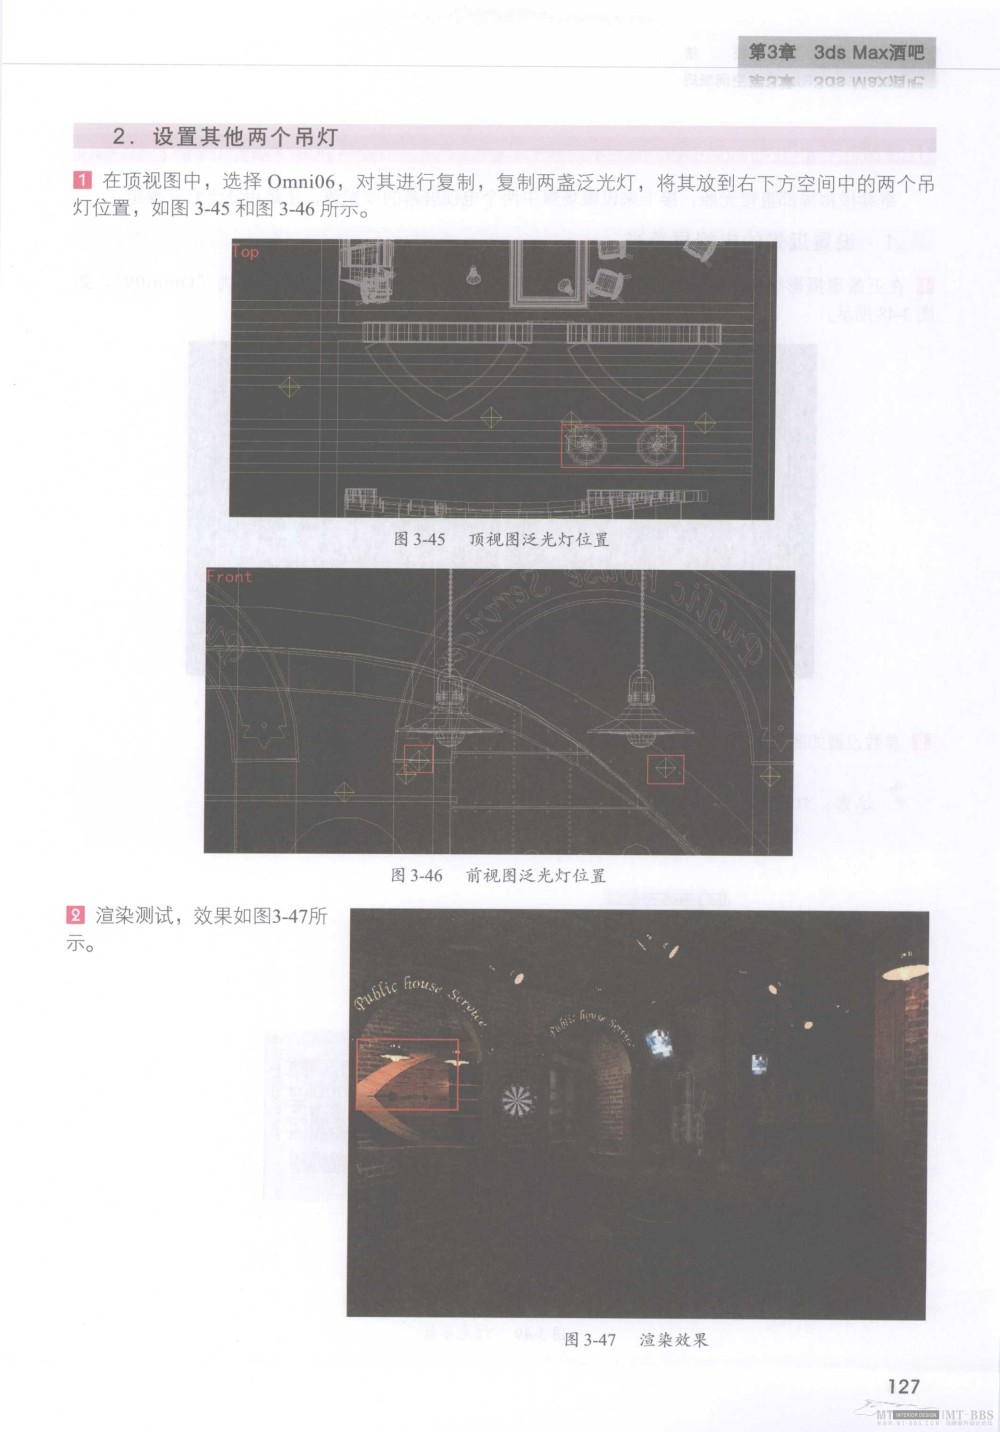 水晶石技法-3ds_Max&VRay室内空间表现_水晶石技法-3ds_Max&VRay室内空间表现_页面_133.jpg